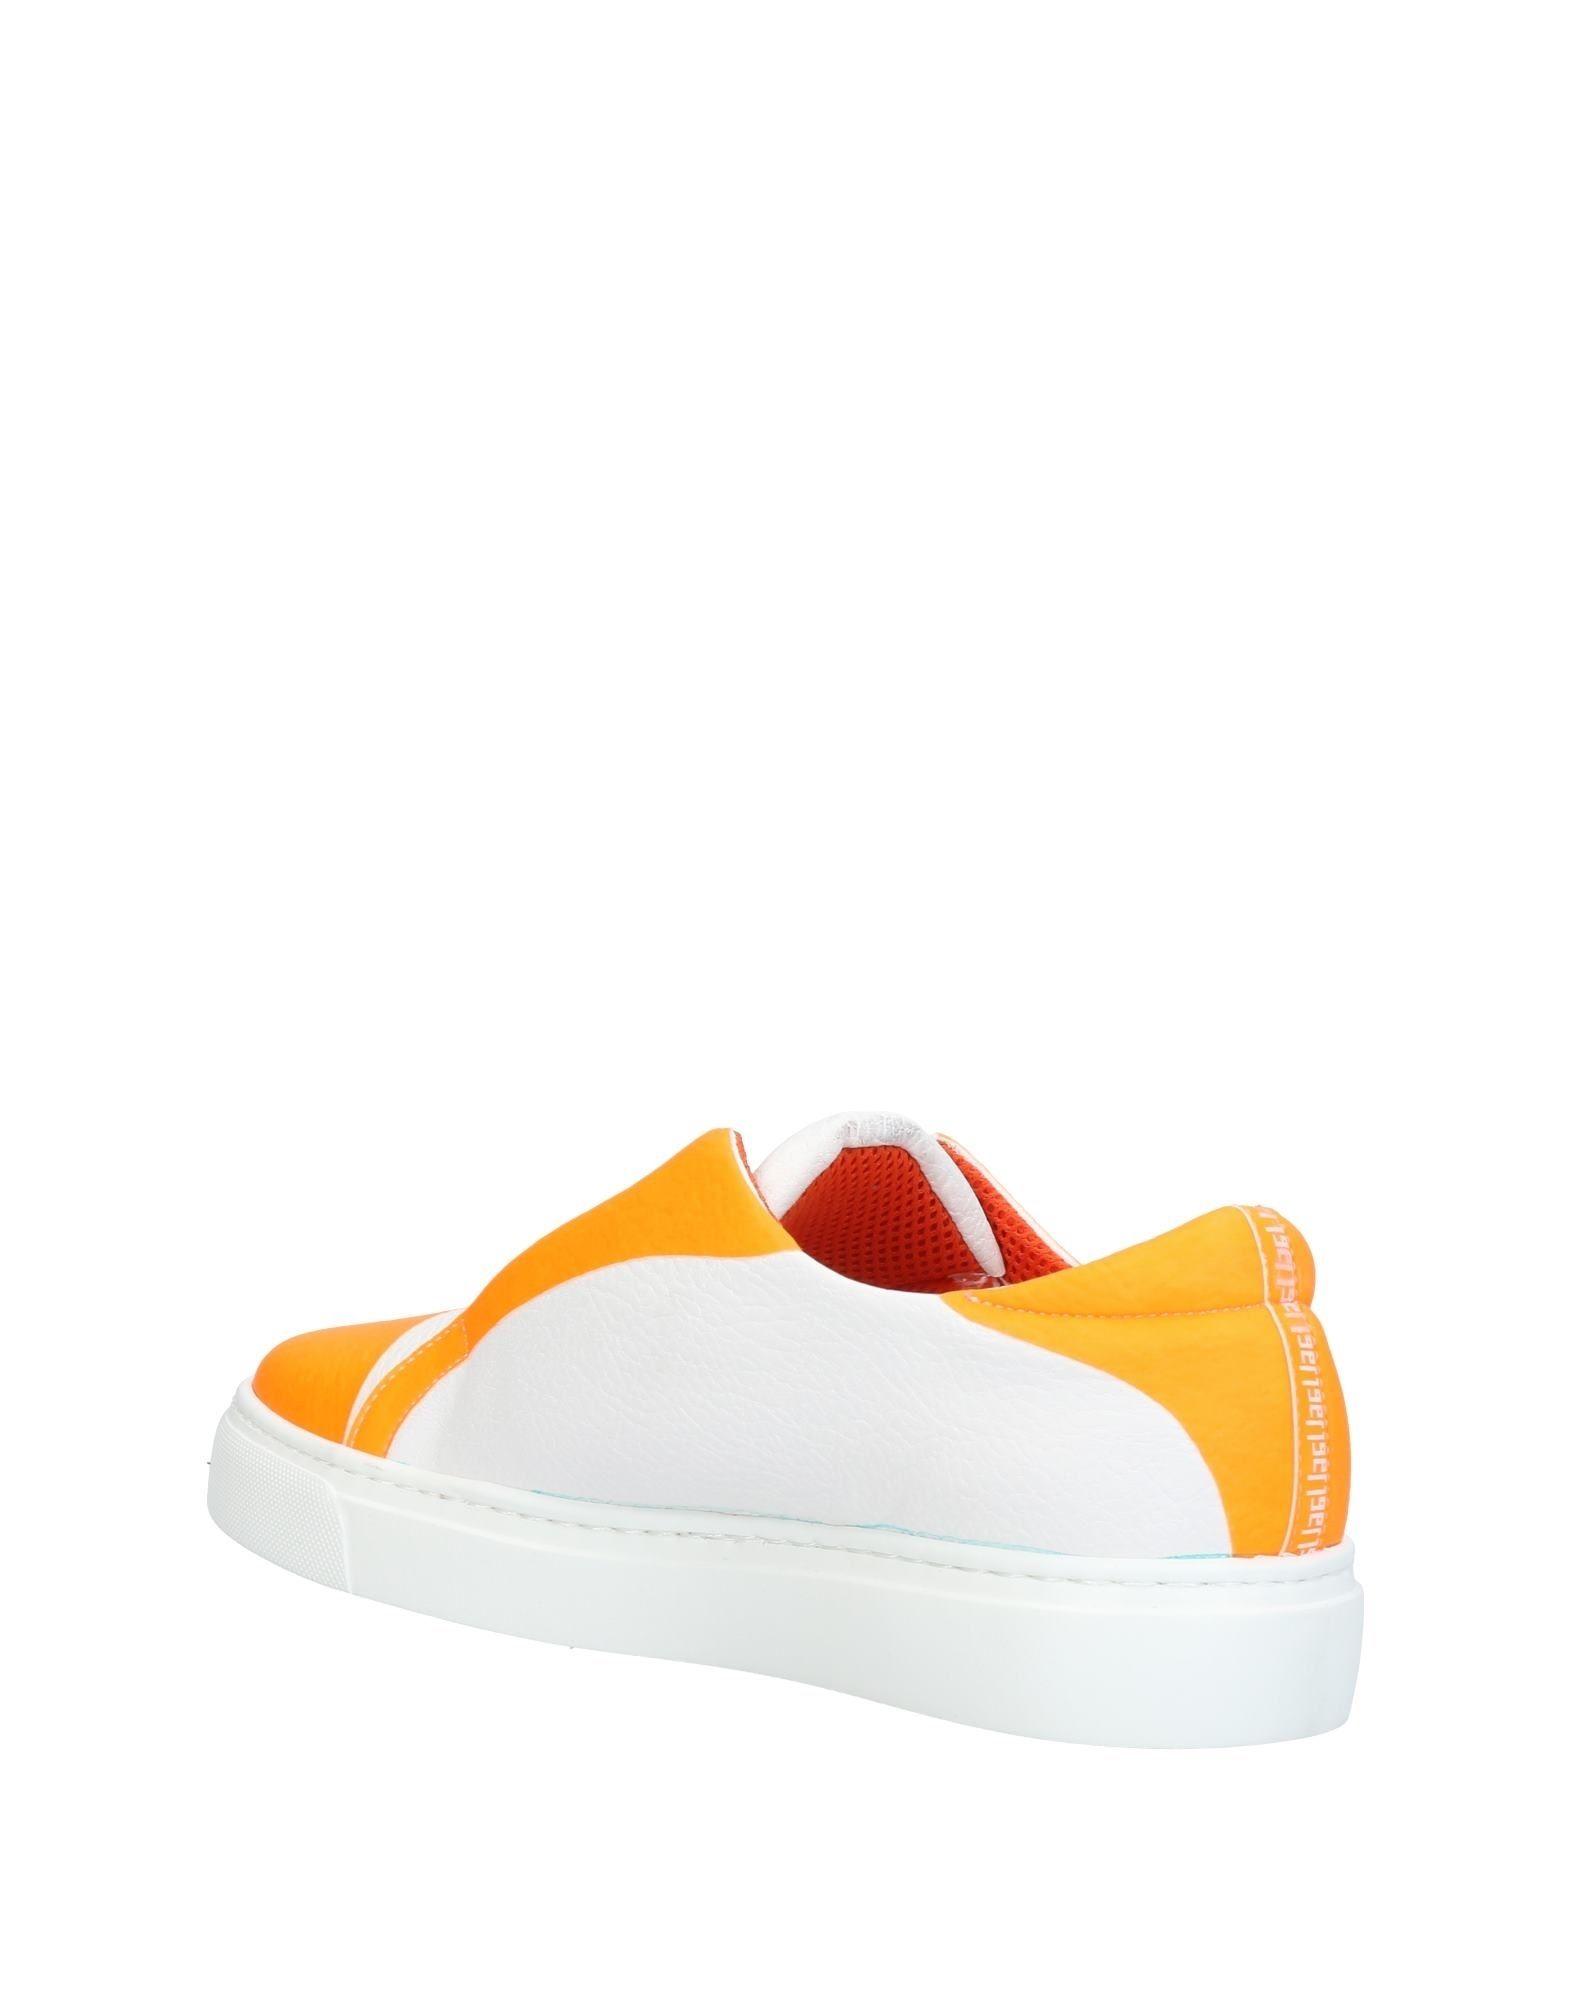 Leonardo Iachini Gute Sneakers Damen  11460504GQ Gute Iachini Qualität beliebte Schuhe 4d130c